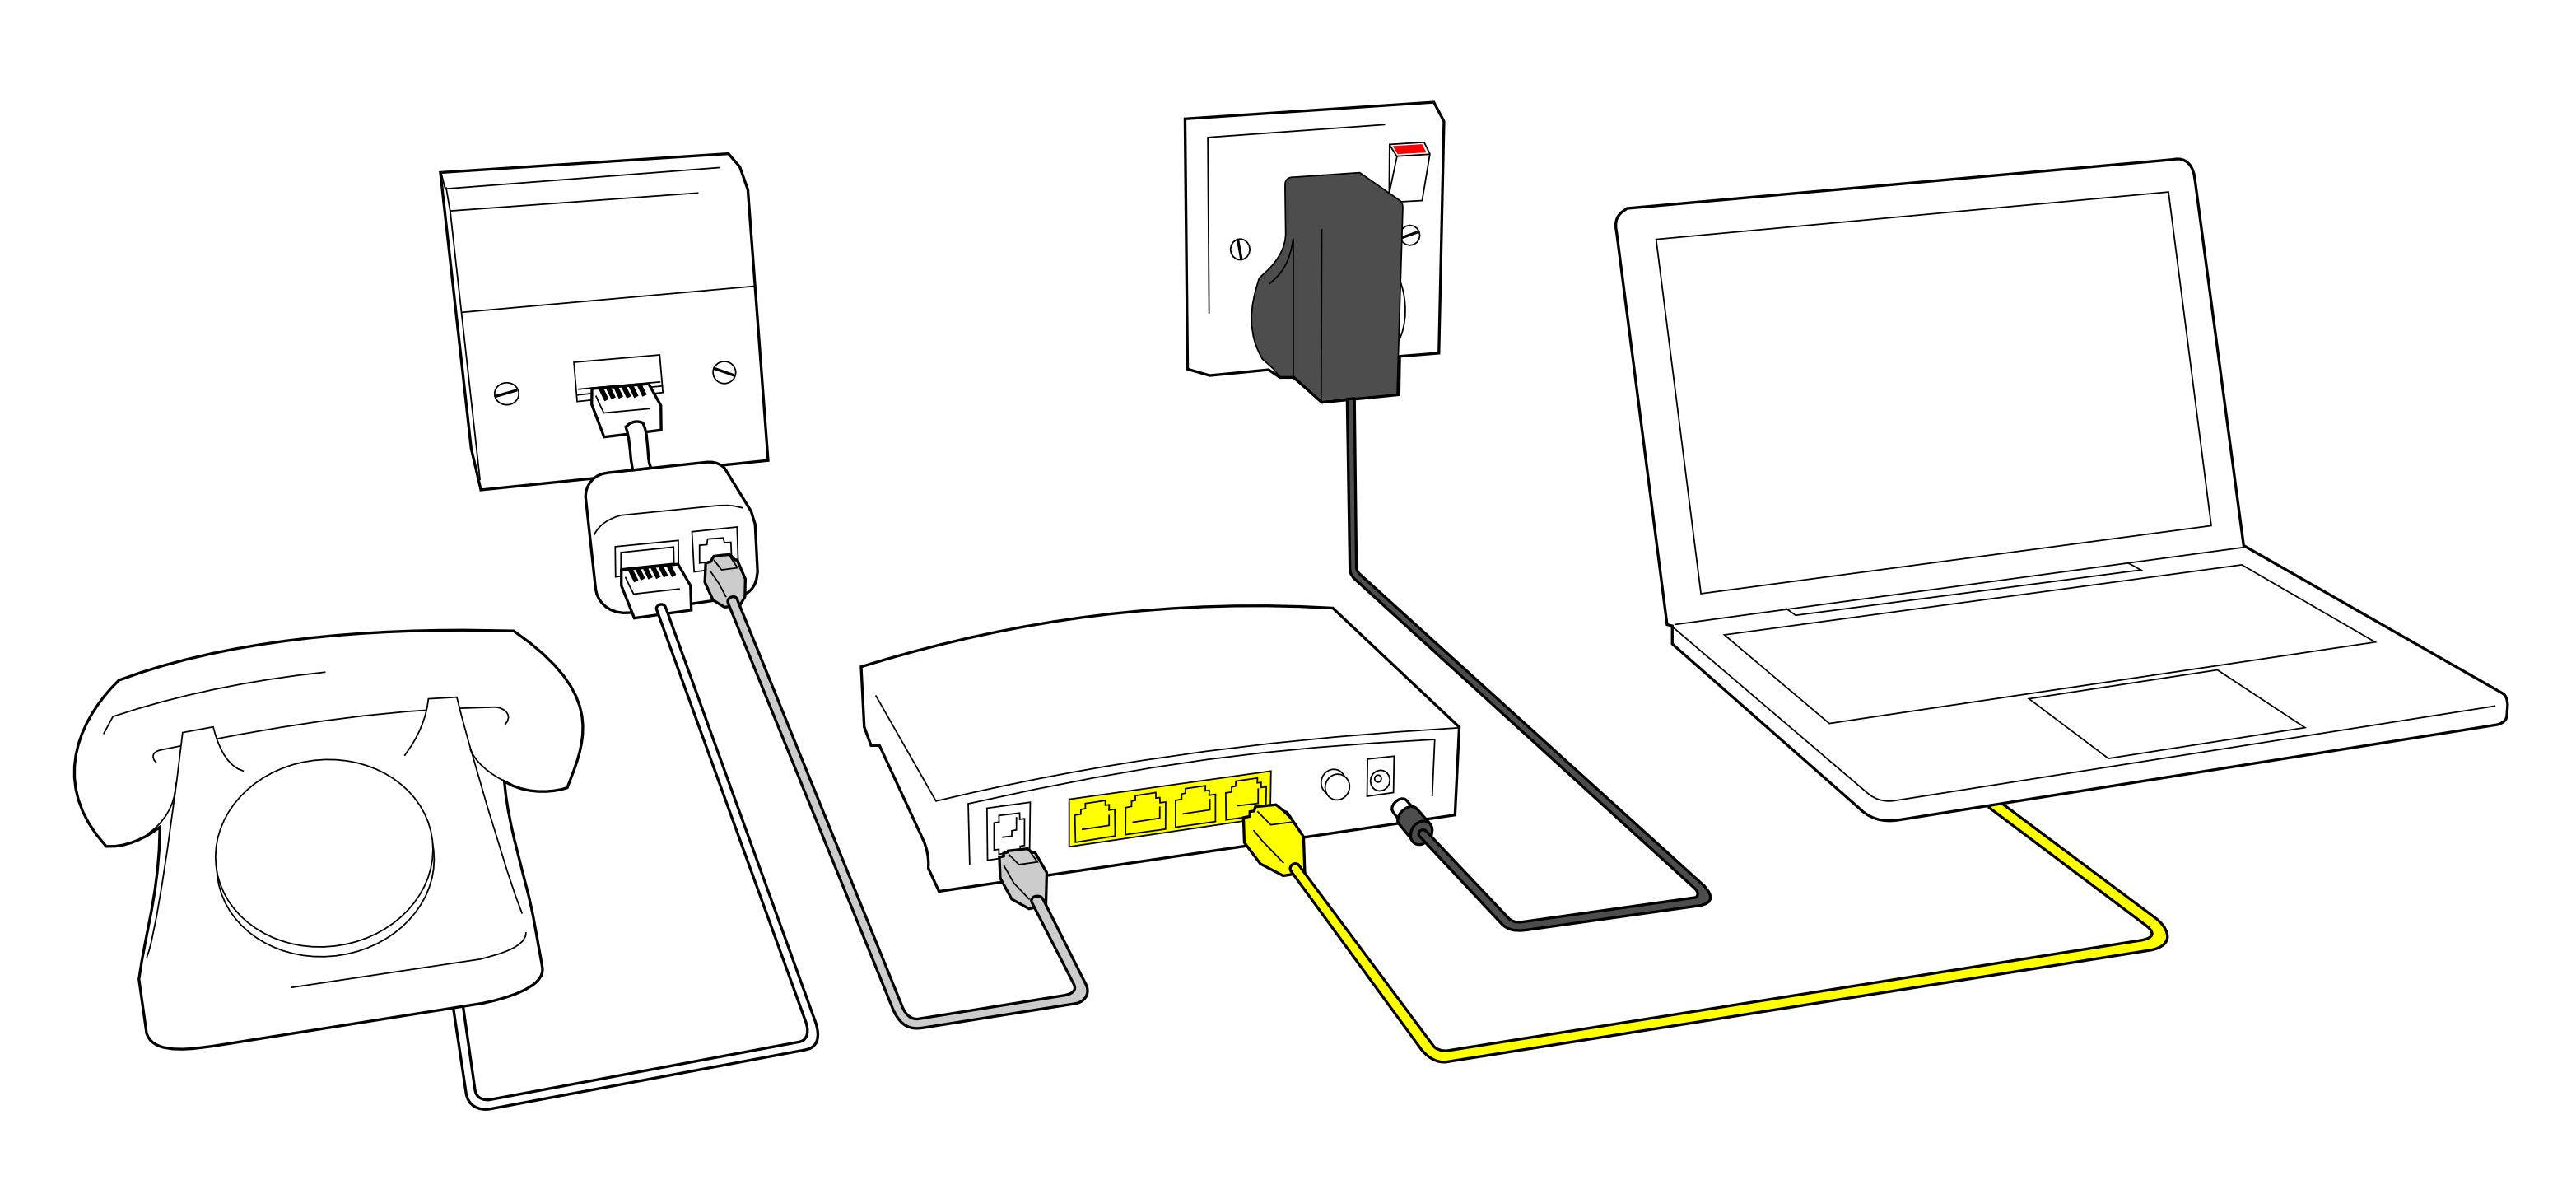 [SCHEMATICS_4FR]  CC_4591] Network Installation Diagram Free Download Wiring Diagram Schematic  Download Diagram | Wired Broadband Diagram |  | Mentra Gram Skat Peted Phae Mohammedshrine Librar Wiring 101